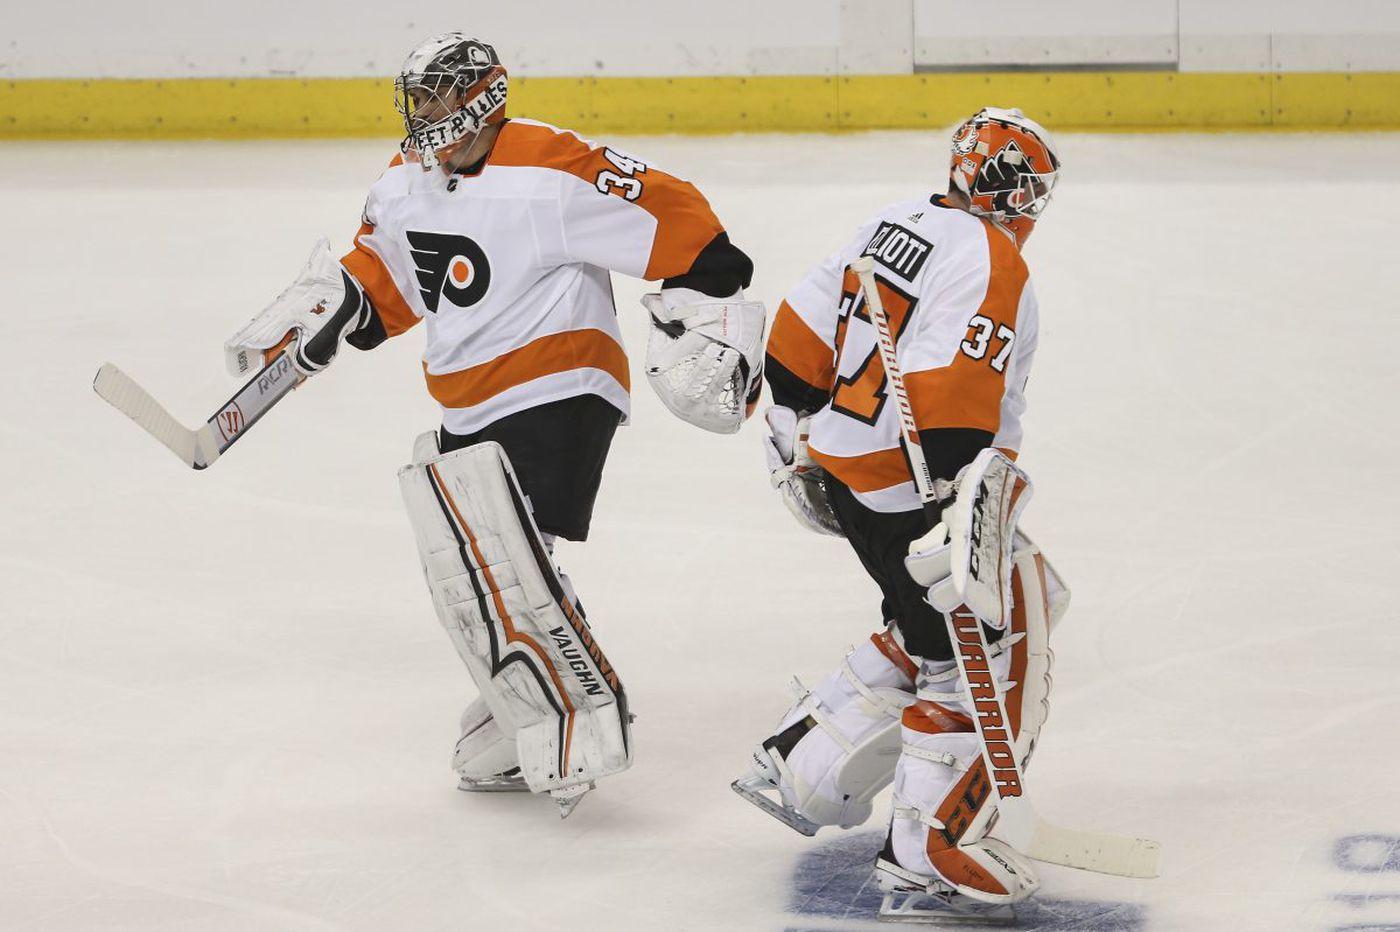 Despite Game 1 result, Flyers keep faith in Brian Elliott